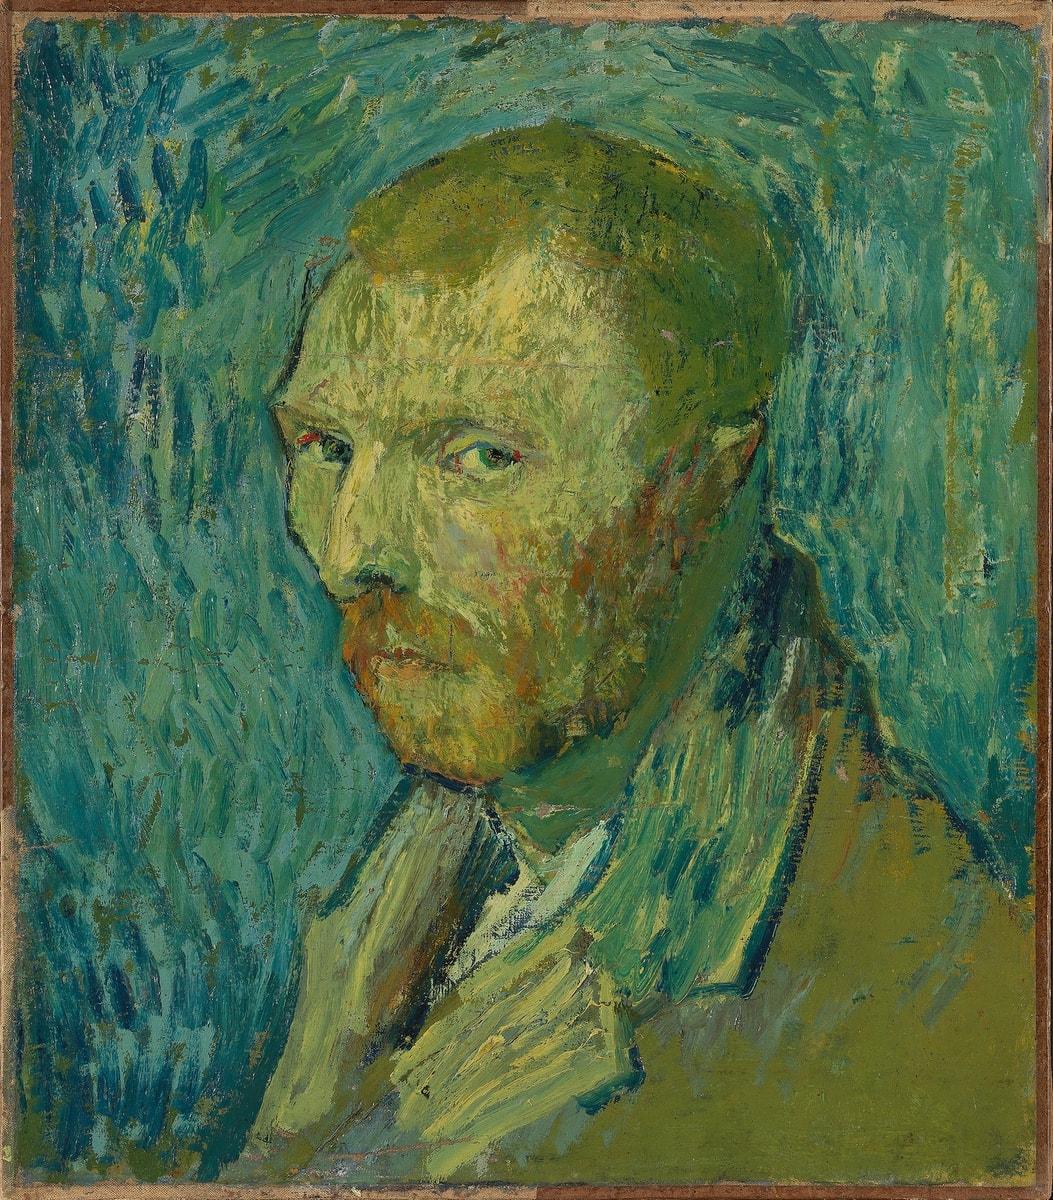 Vincent van Gogh: Selbstporträt als Maler, Paris, 1886, Öl auf Leinwand, © Van Gogh Museum, Amsterdam (Vincent van Gogh Foundation)